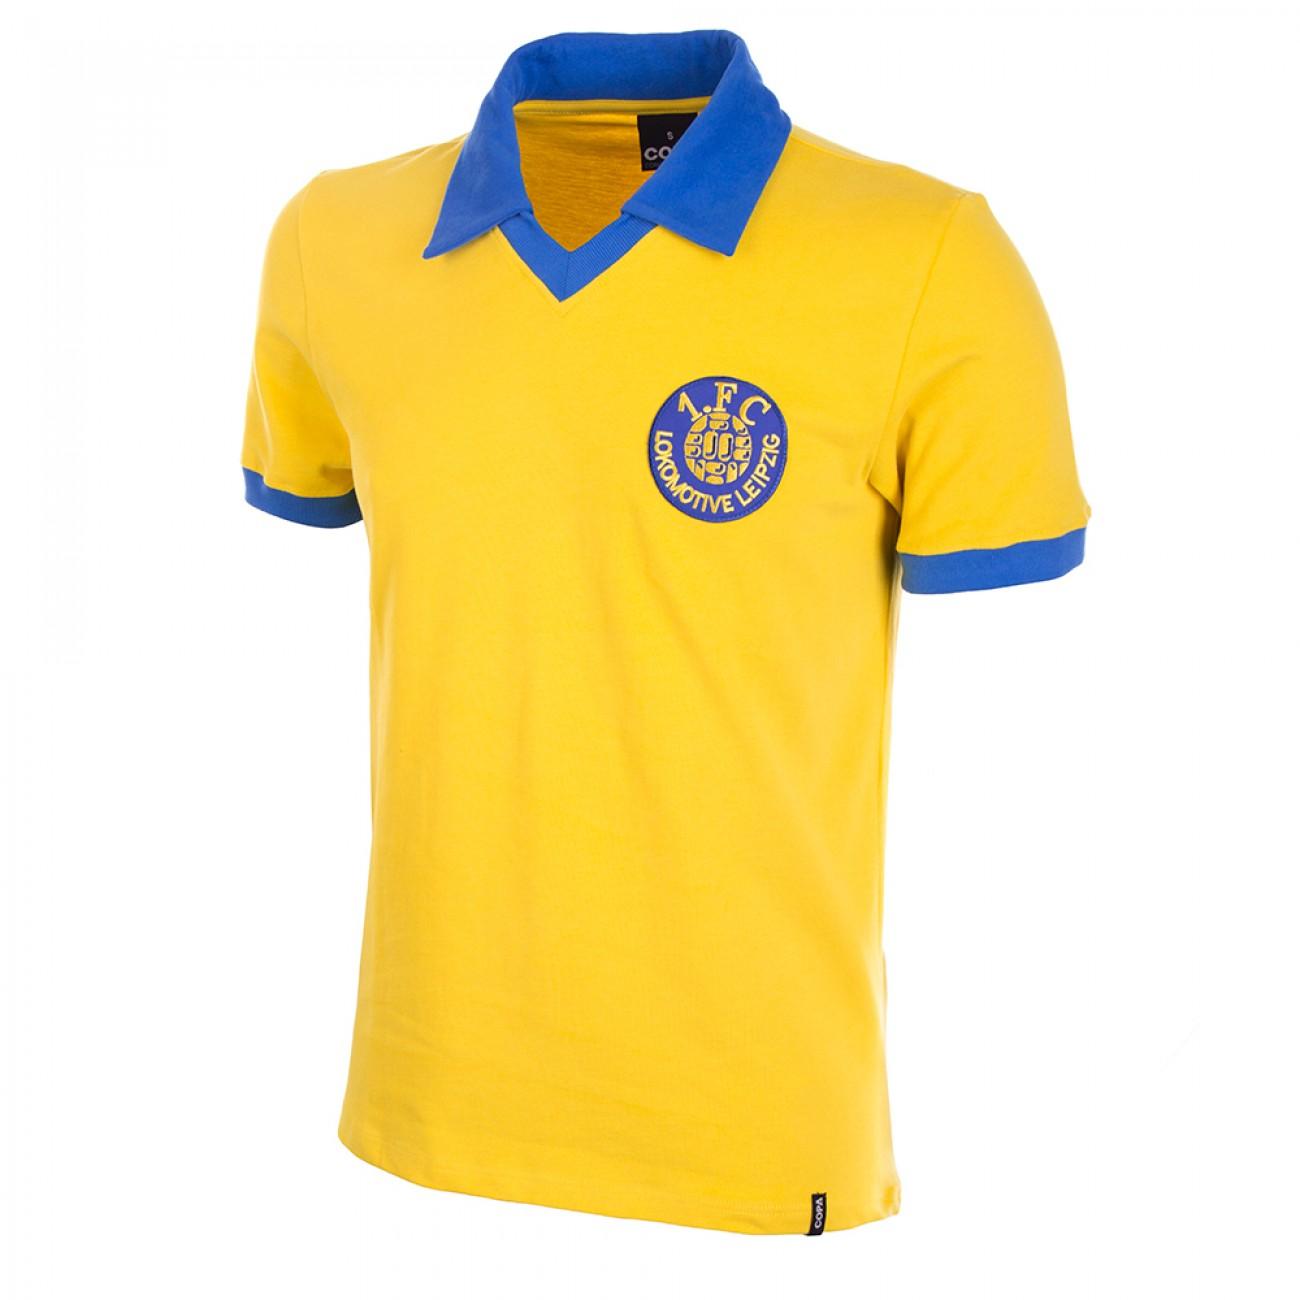 http://www.retrofootball.es/ropa-de-futbol/camiseta-lokomotive-leipzig-a-os-80.html